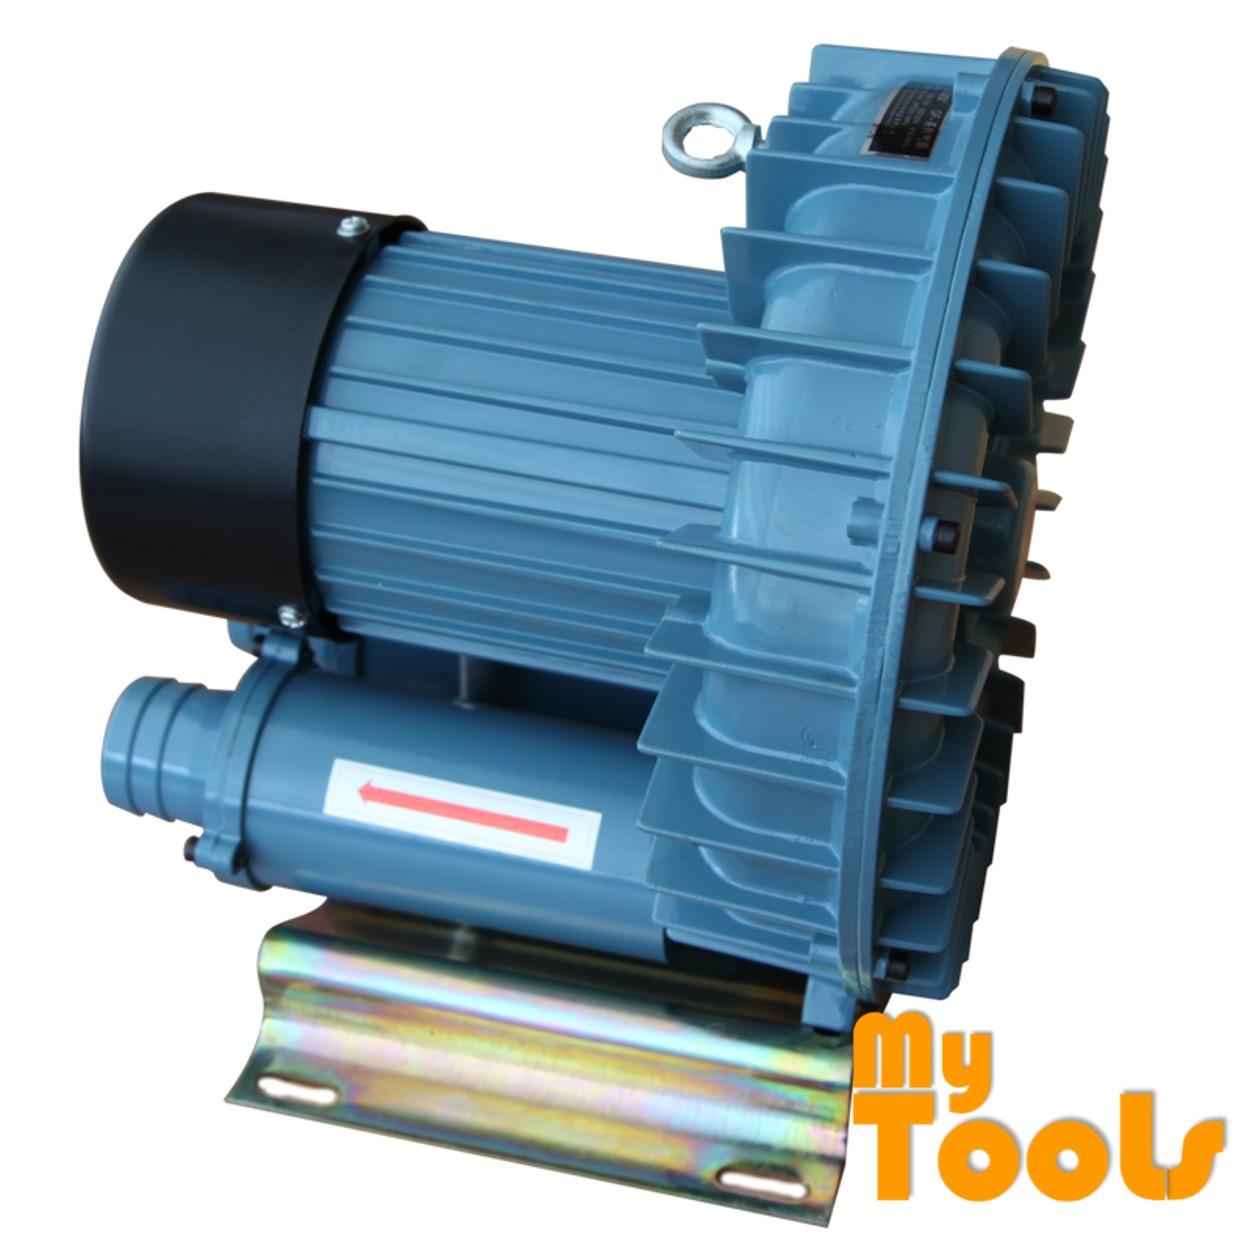 RESUN GF-1100 1100W 1800L/min Electric Air Ring Blower Aquarium Seafood Compressor Pond Aerator Pump